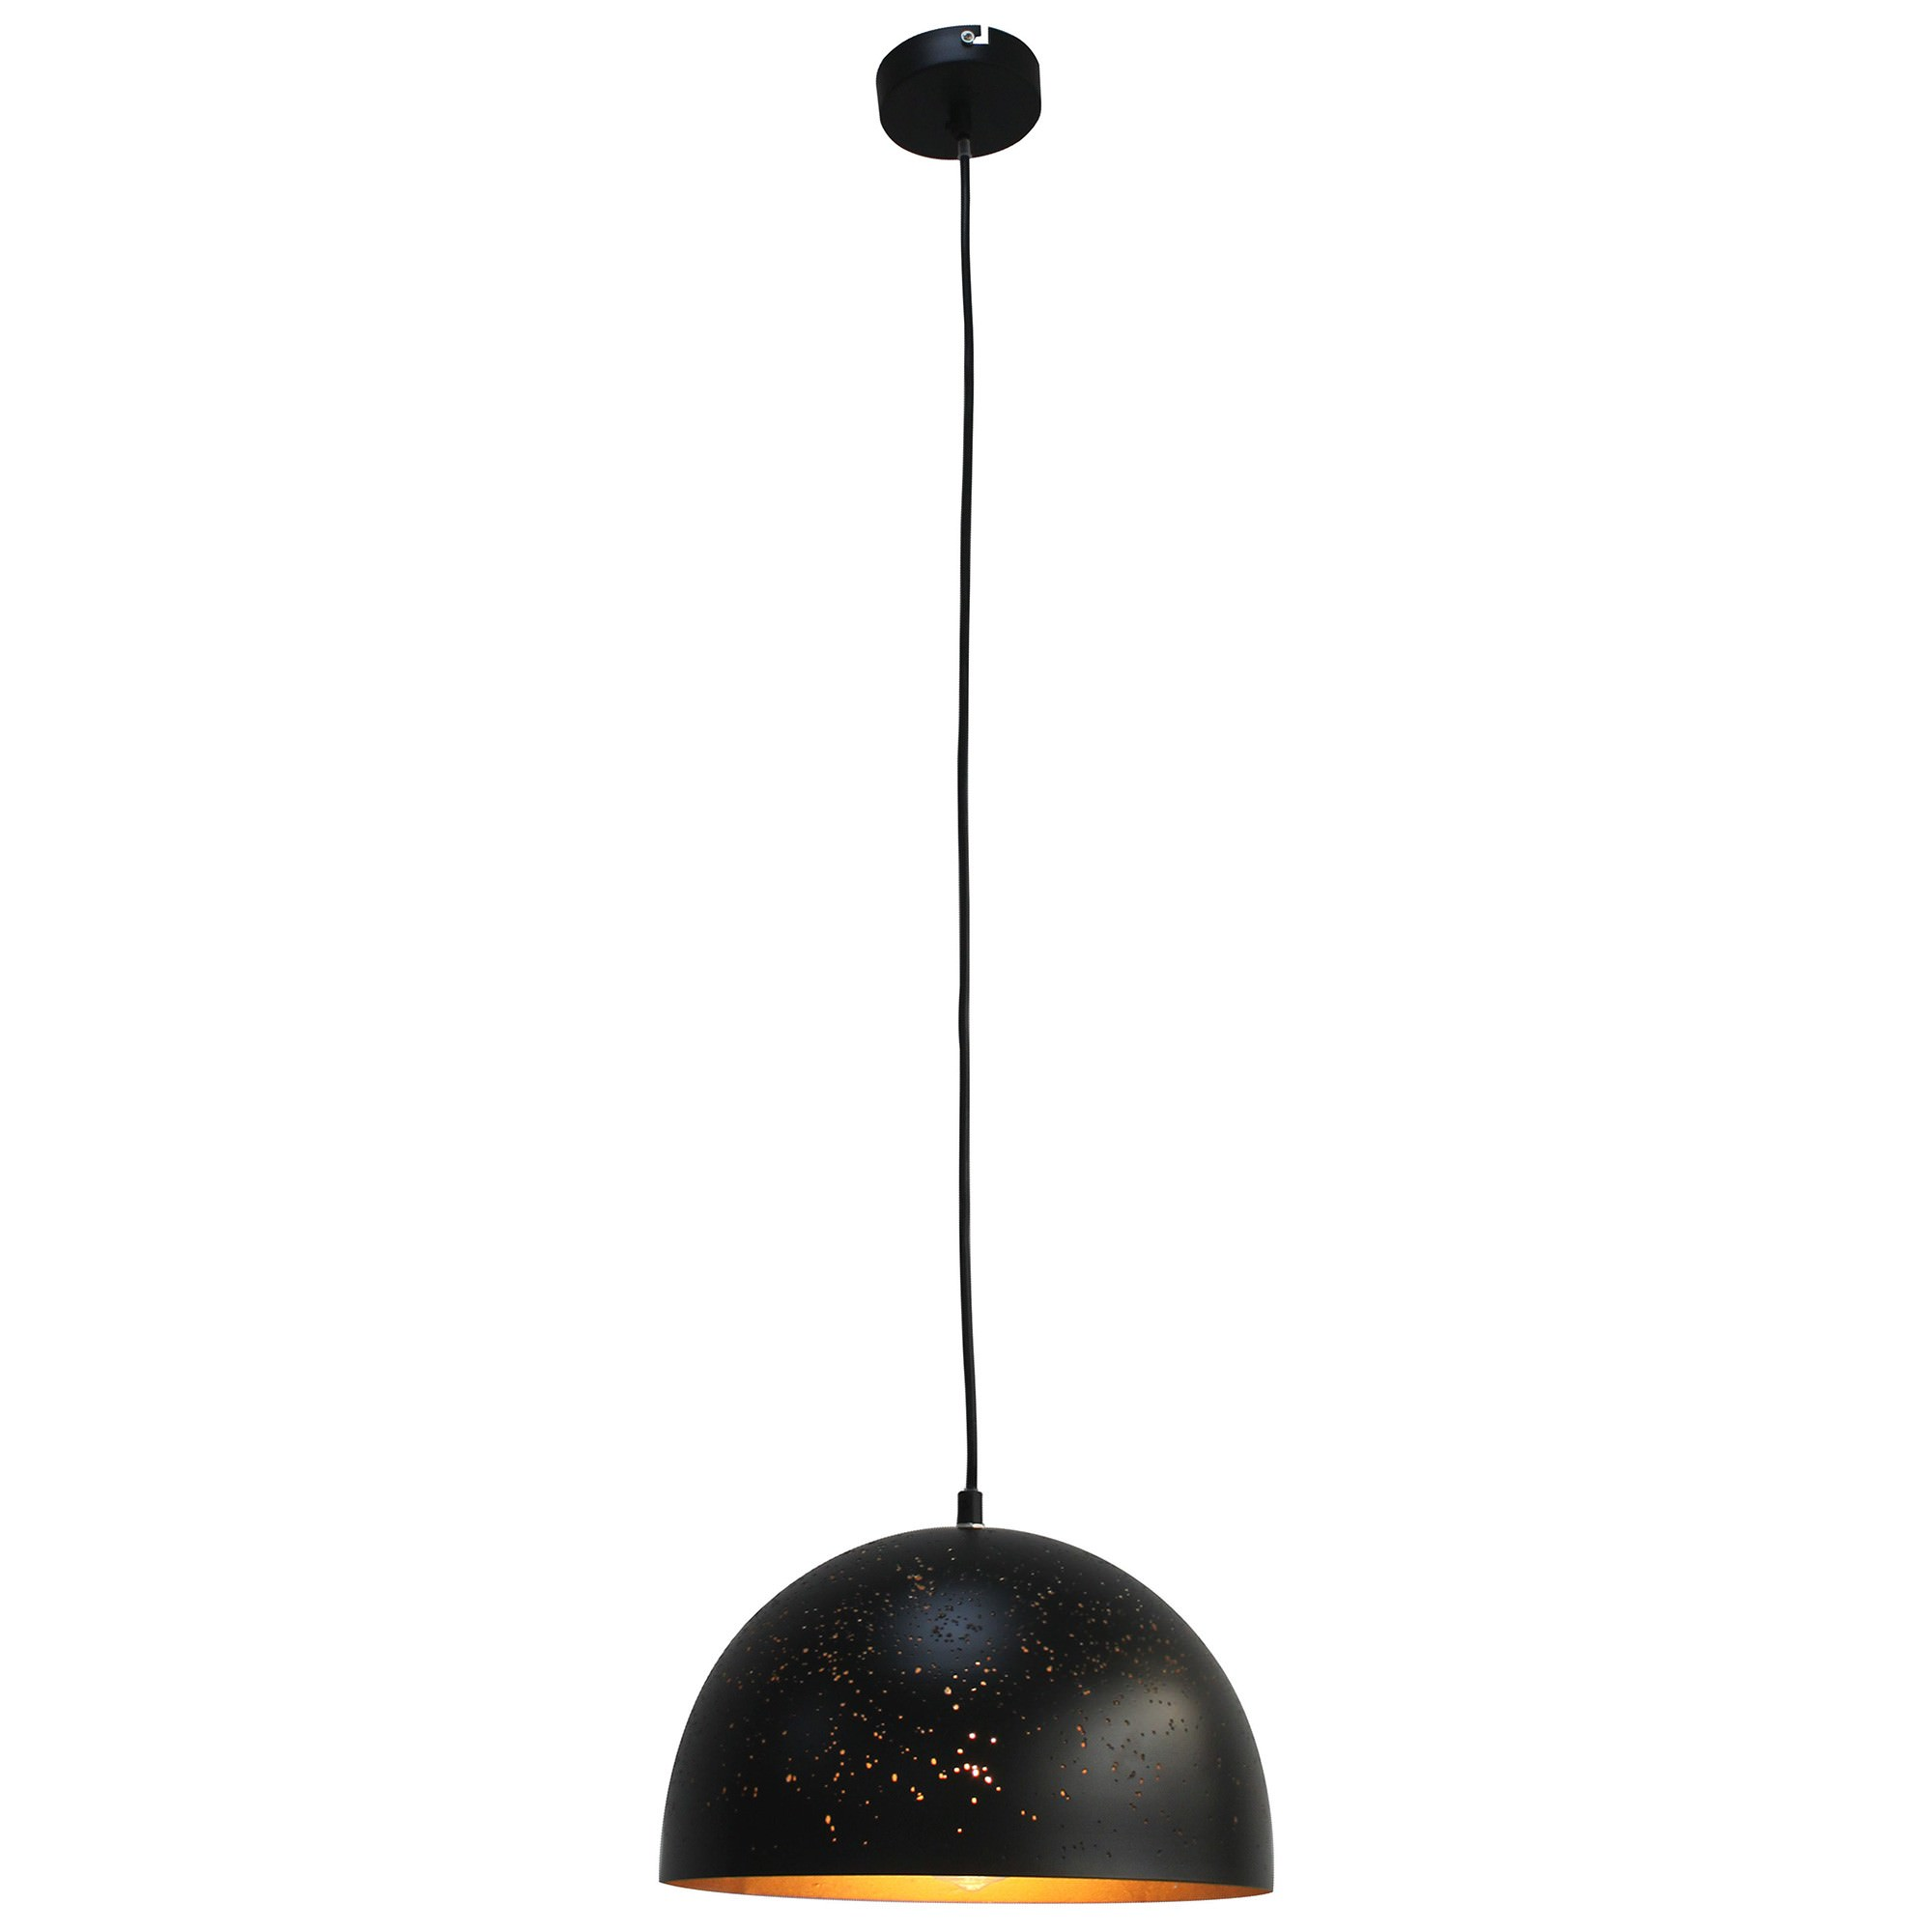 Bardem Metal Pendant Light, 40cm, Black